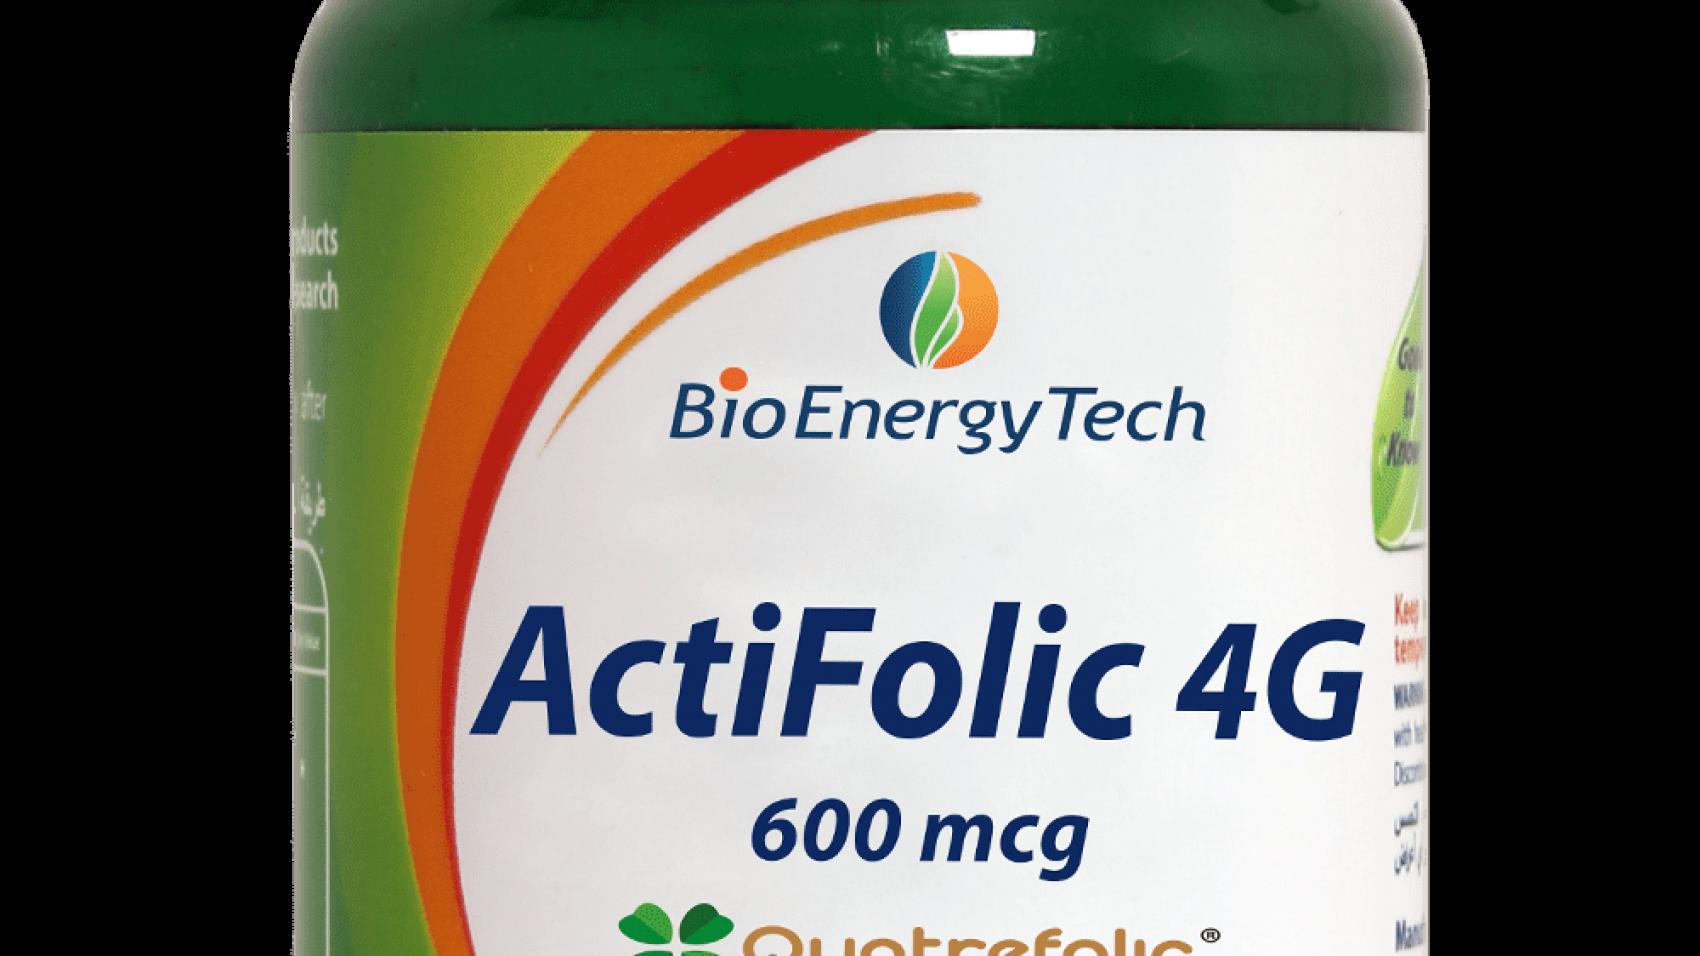 ActiFolic 4G